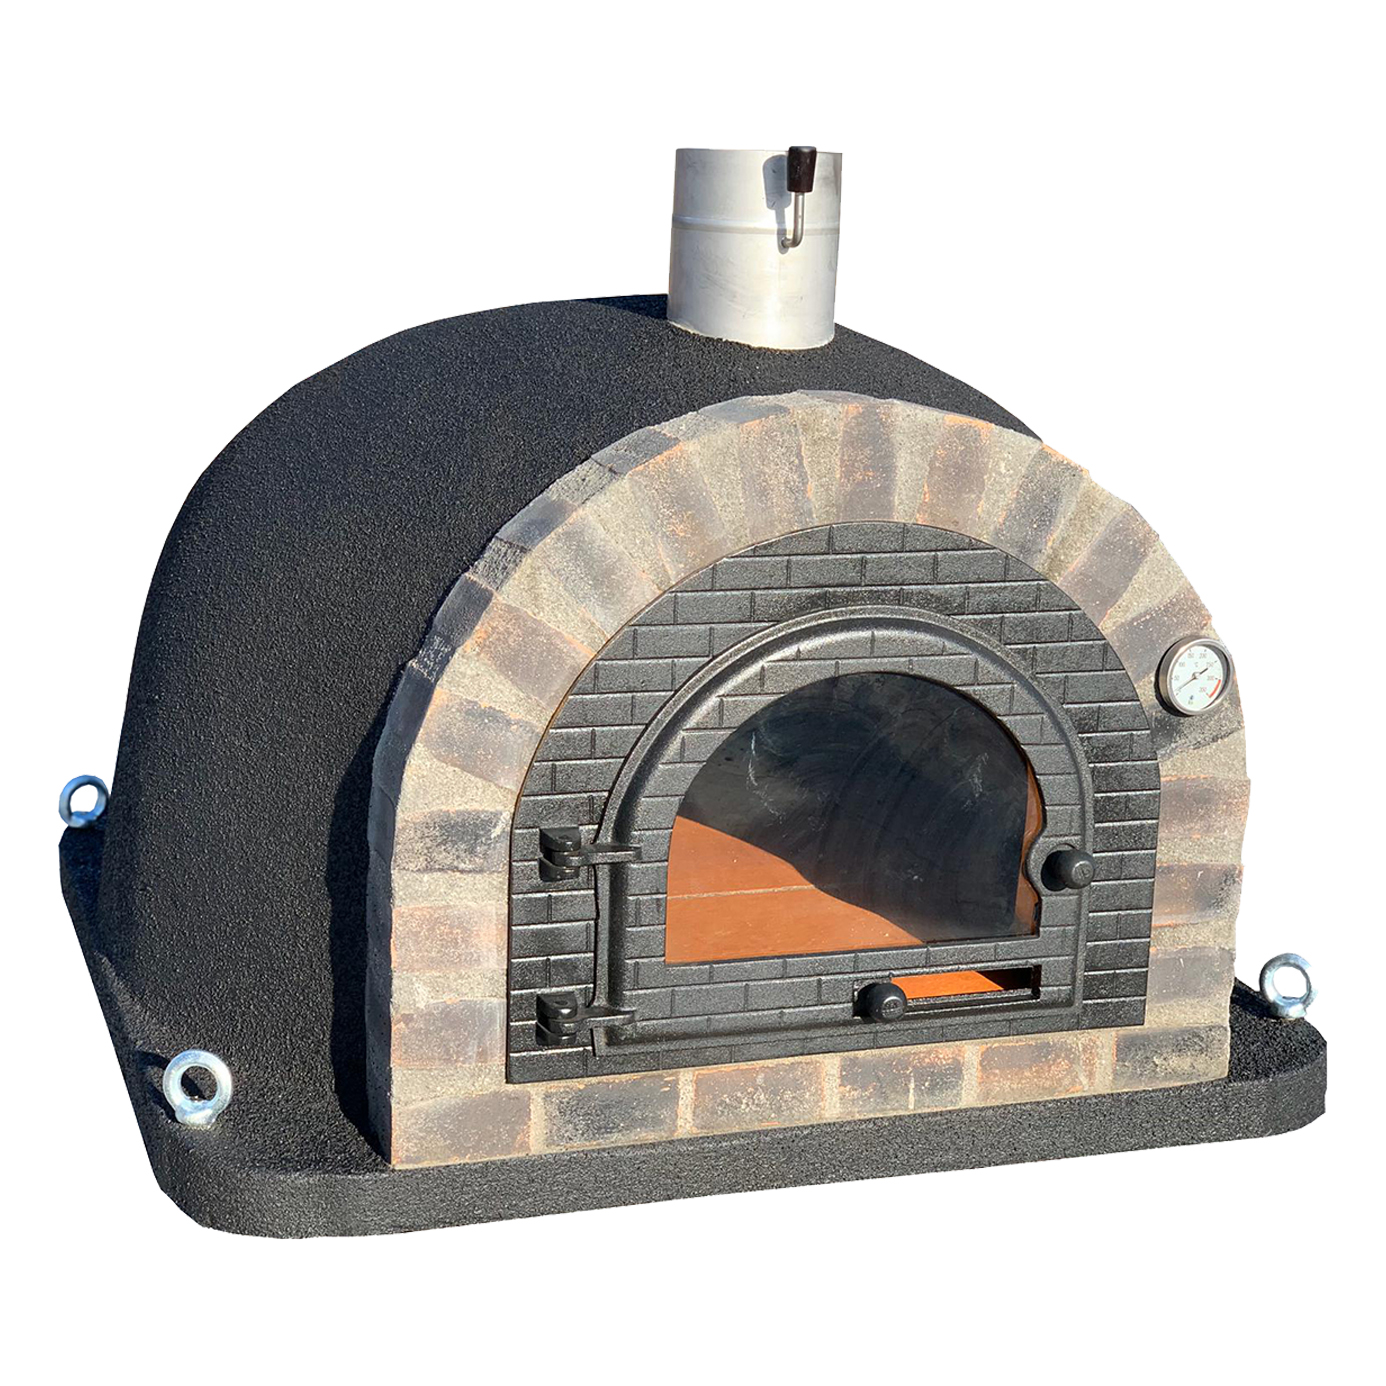 Pizzaugn | Vedugn | Stenugn Forno Deluxe svart med svart rustikt tegel